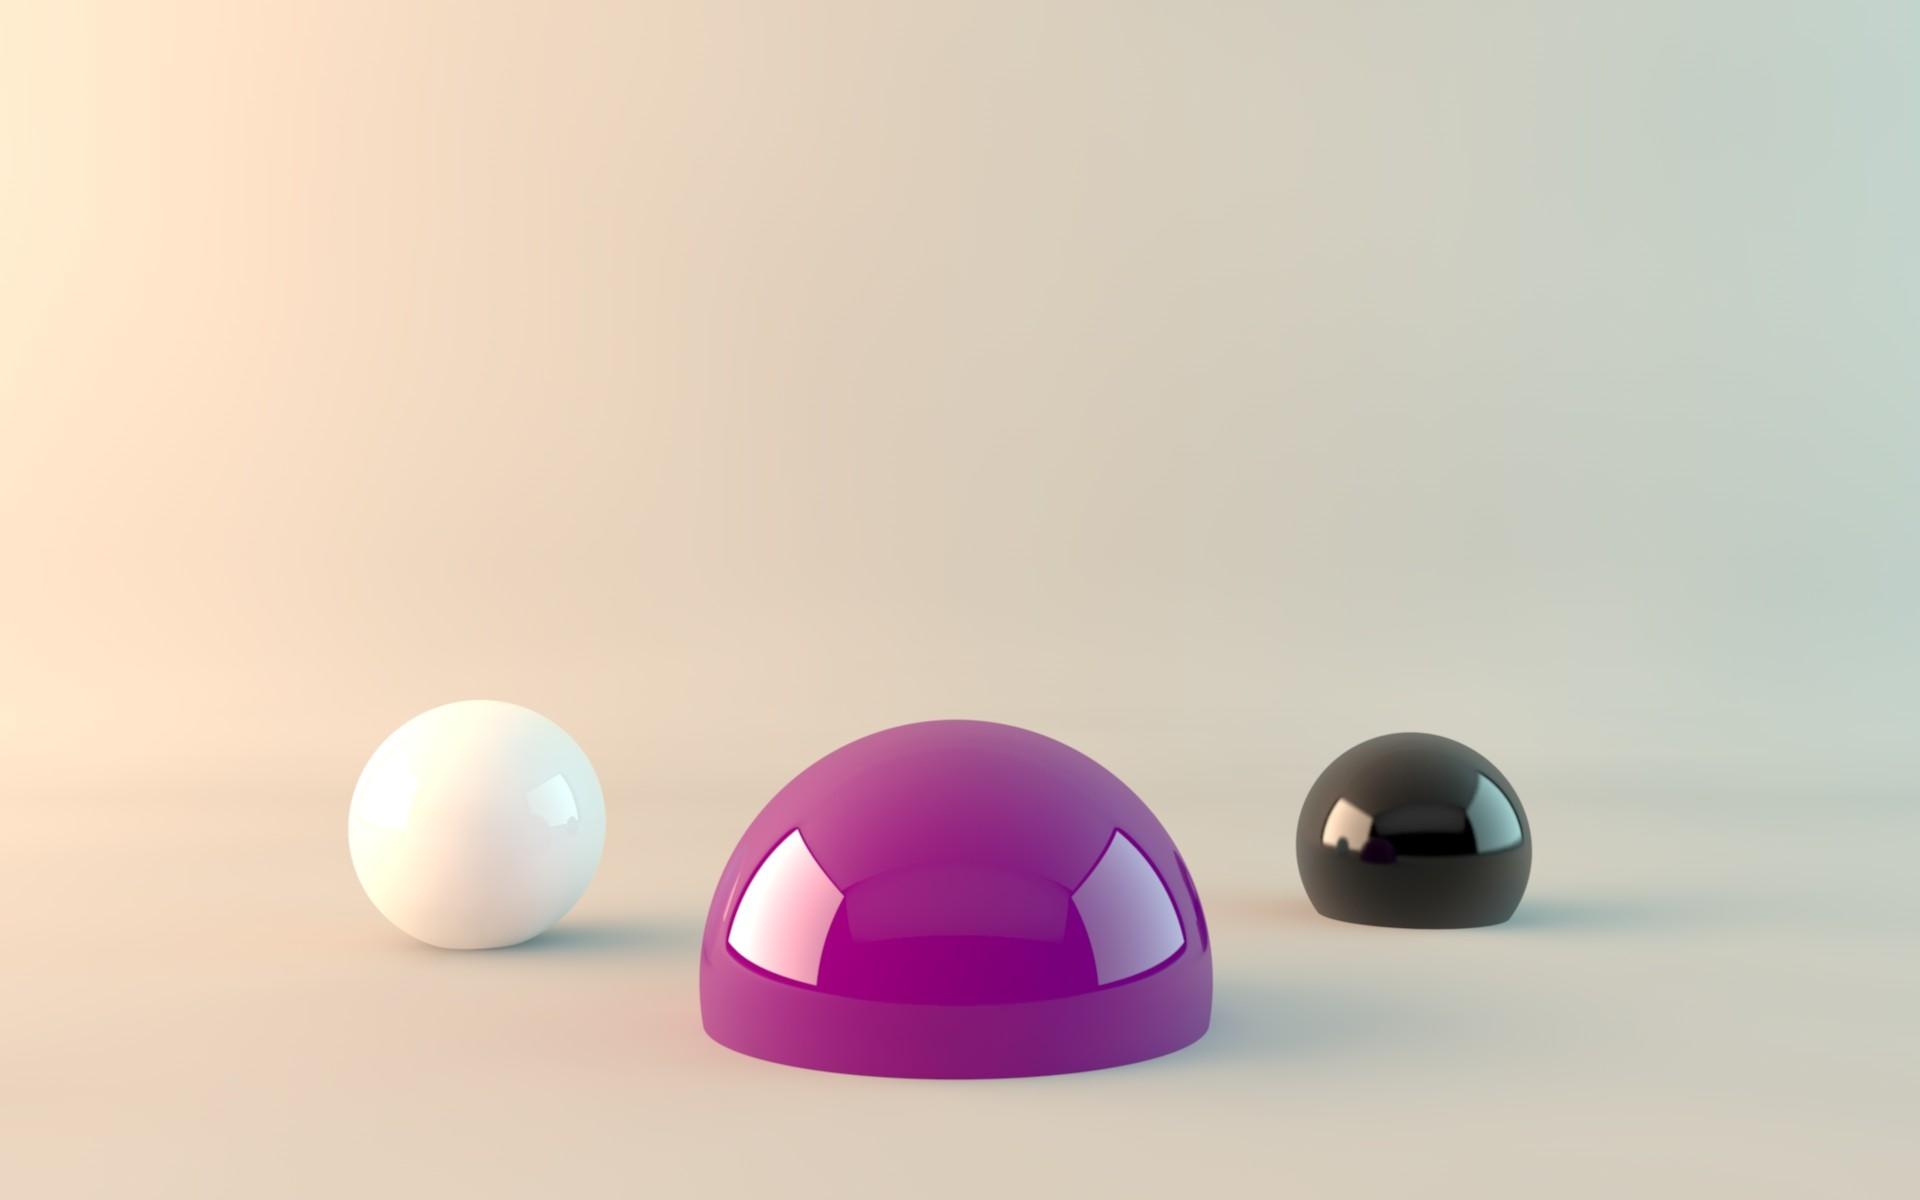 Abstracto objetos - 1920x1200